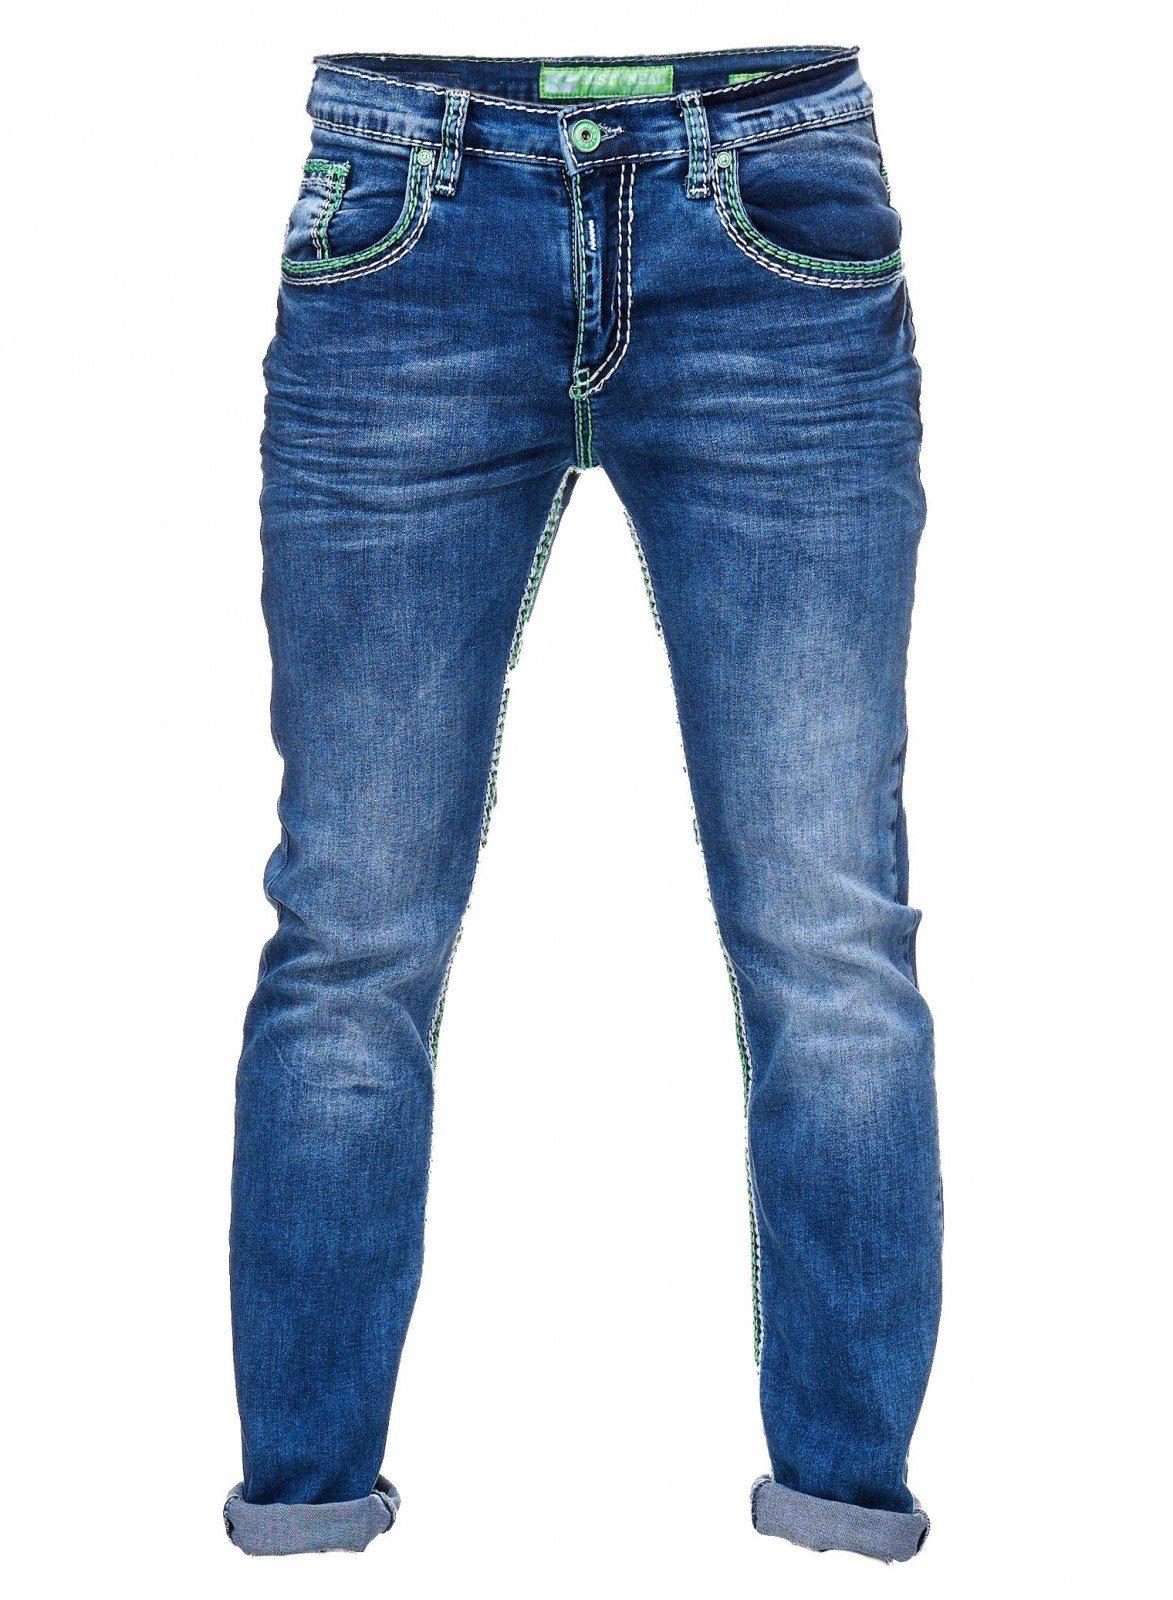 6170718e4e828b Bildquelle: Rusty Neal Jeans mit farblich abgesetzten Nähten